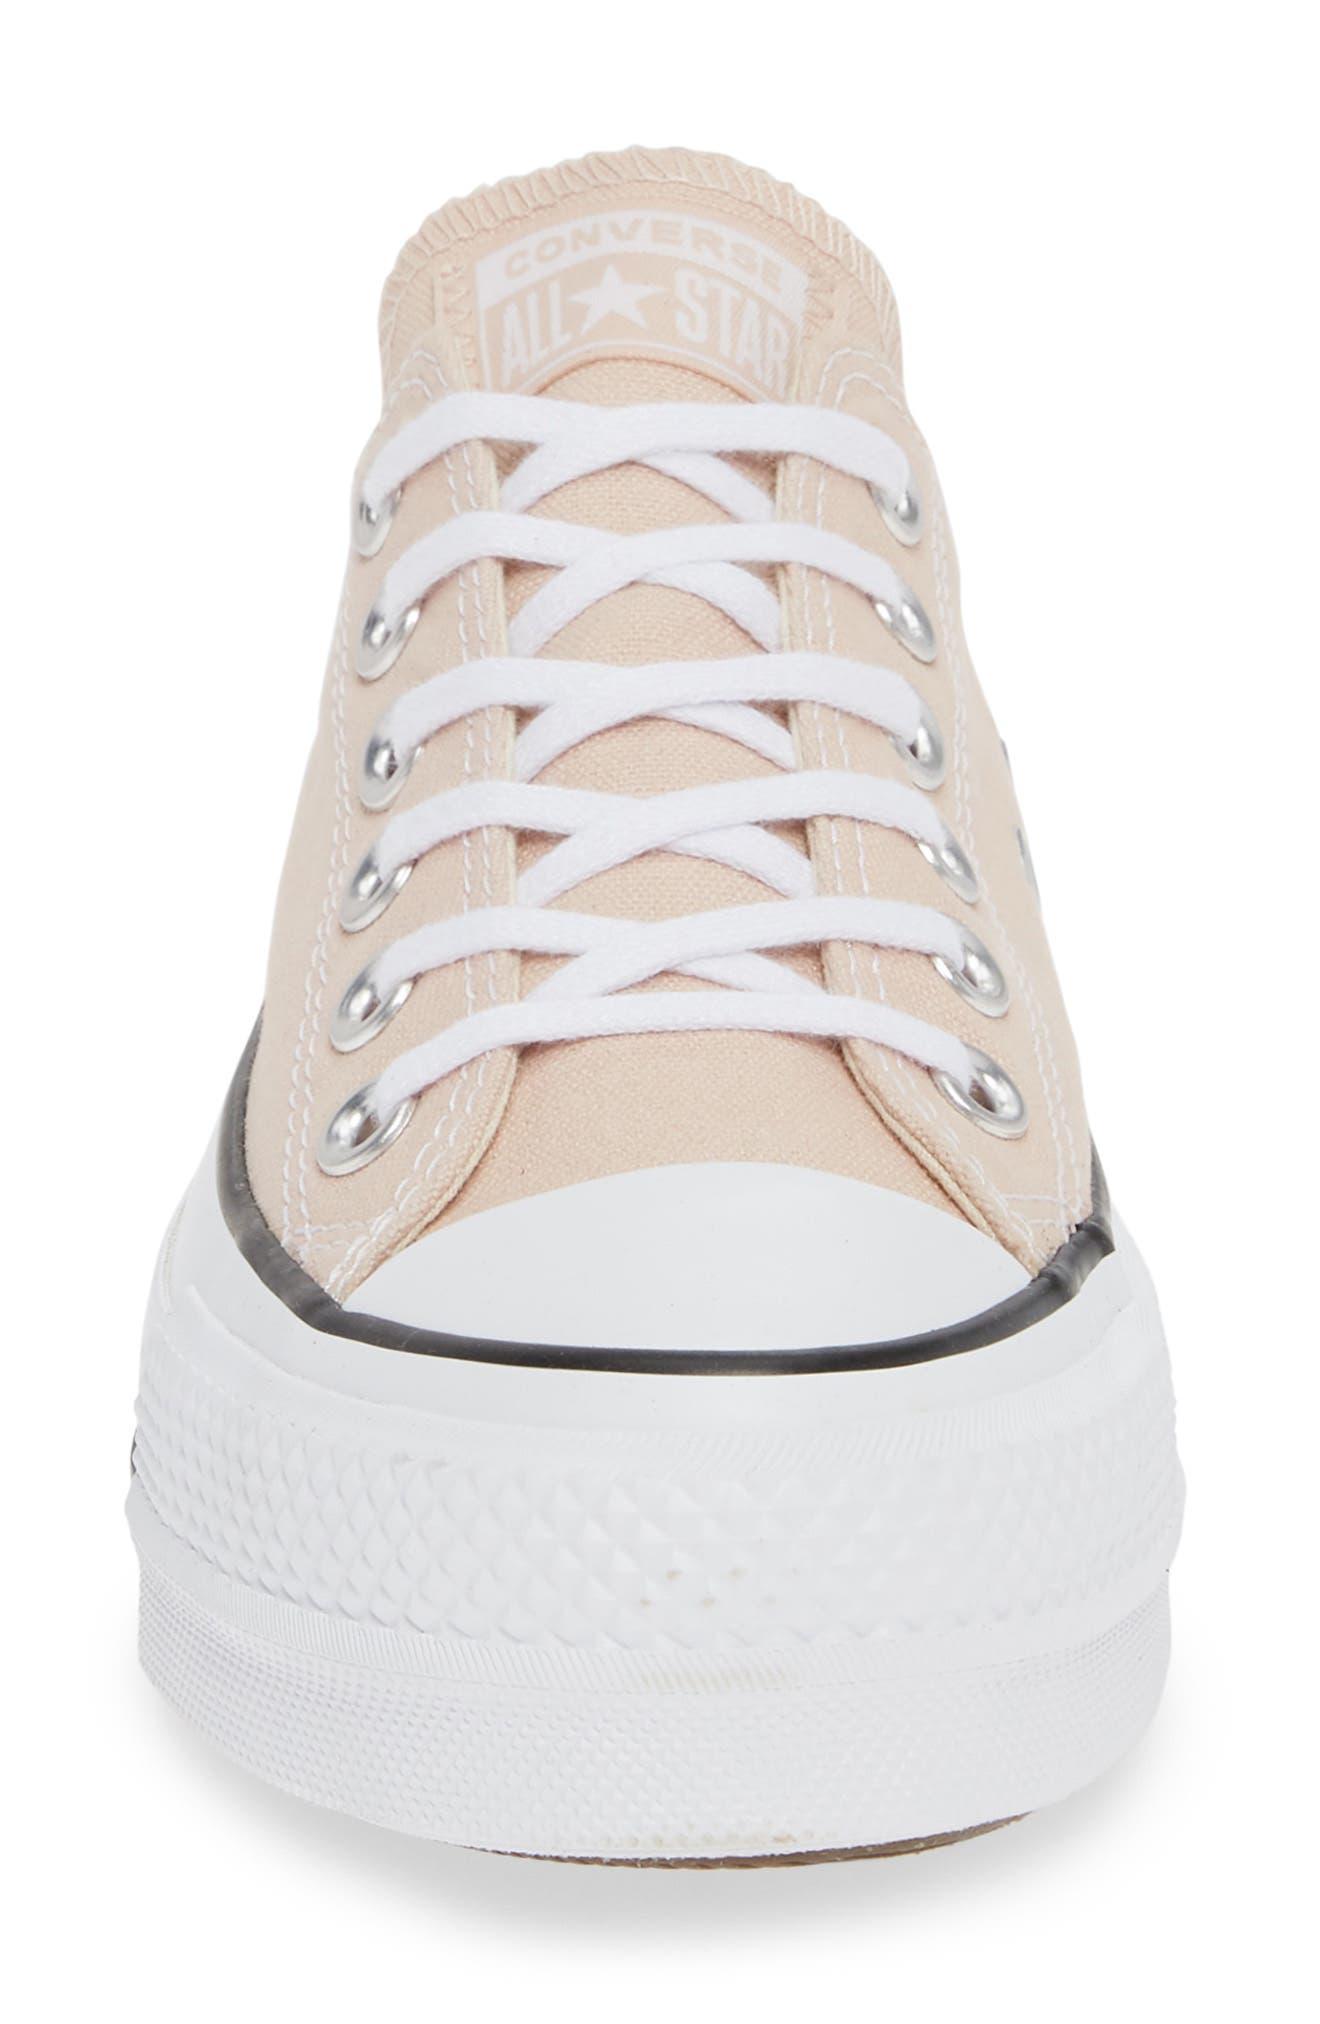 CONVERSE,                             Chuck Taylor<sup>®</sup> All Star<sup>®</sup> Platform Sneaker,                             Alternate thumbnail 4, color,                             650